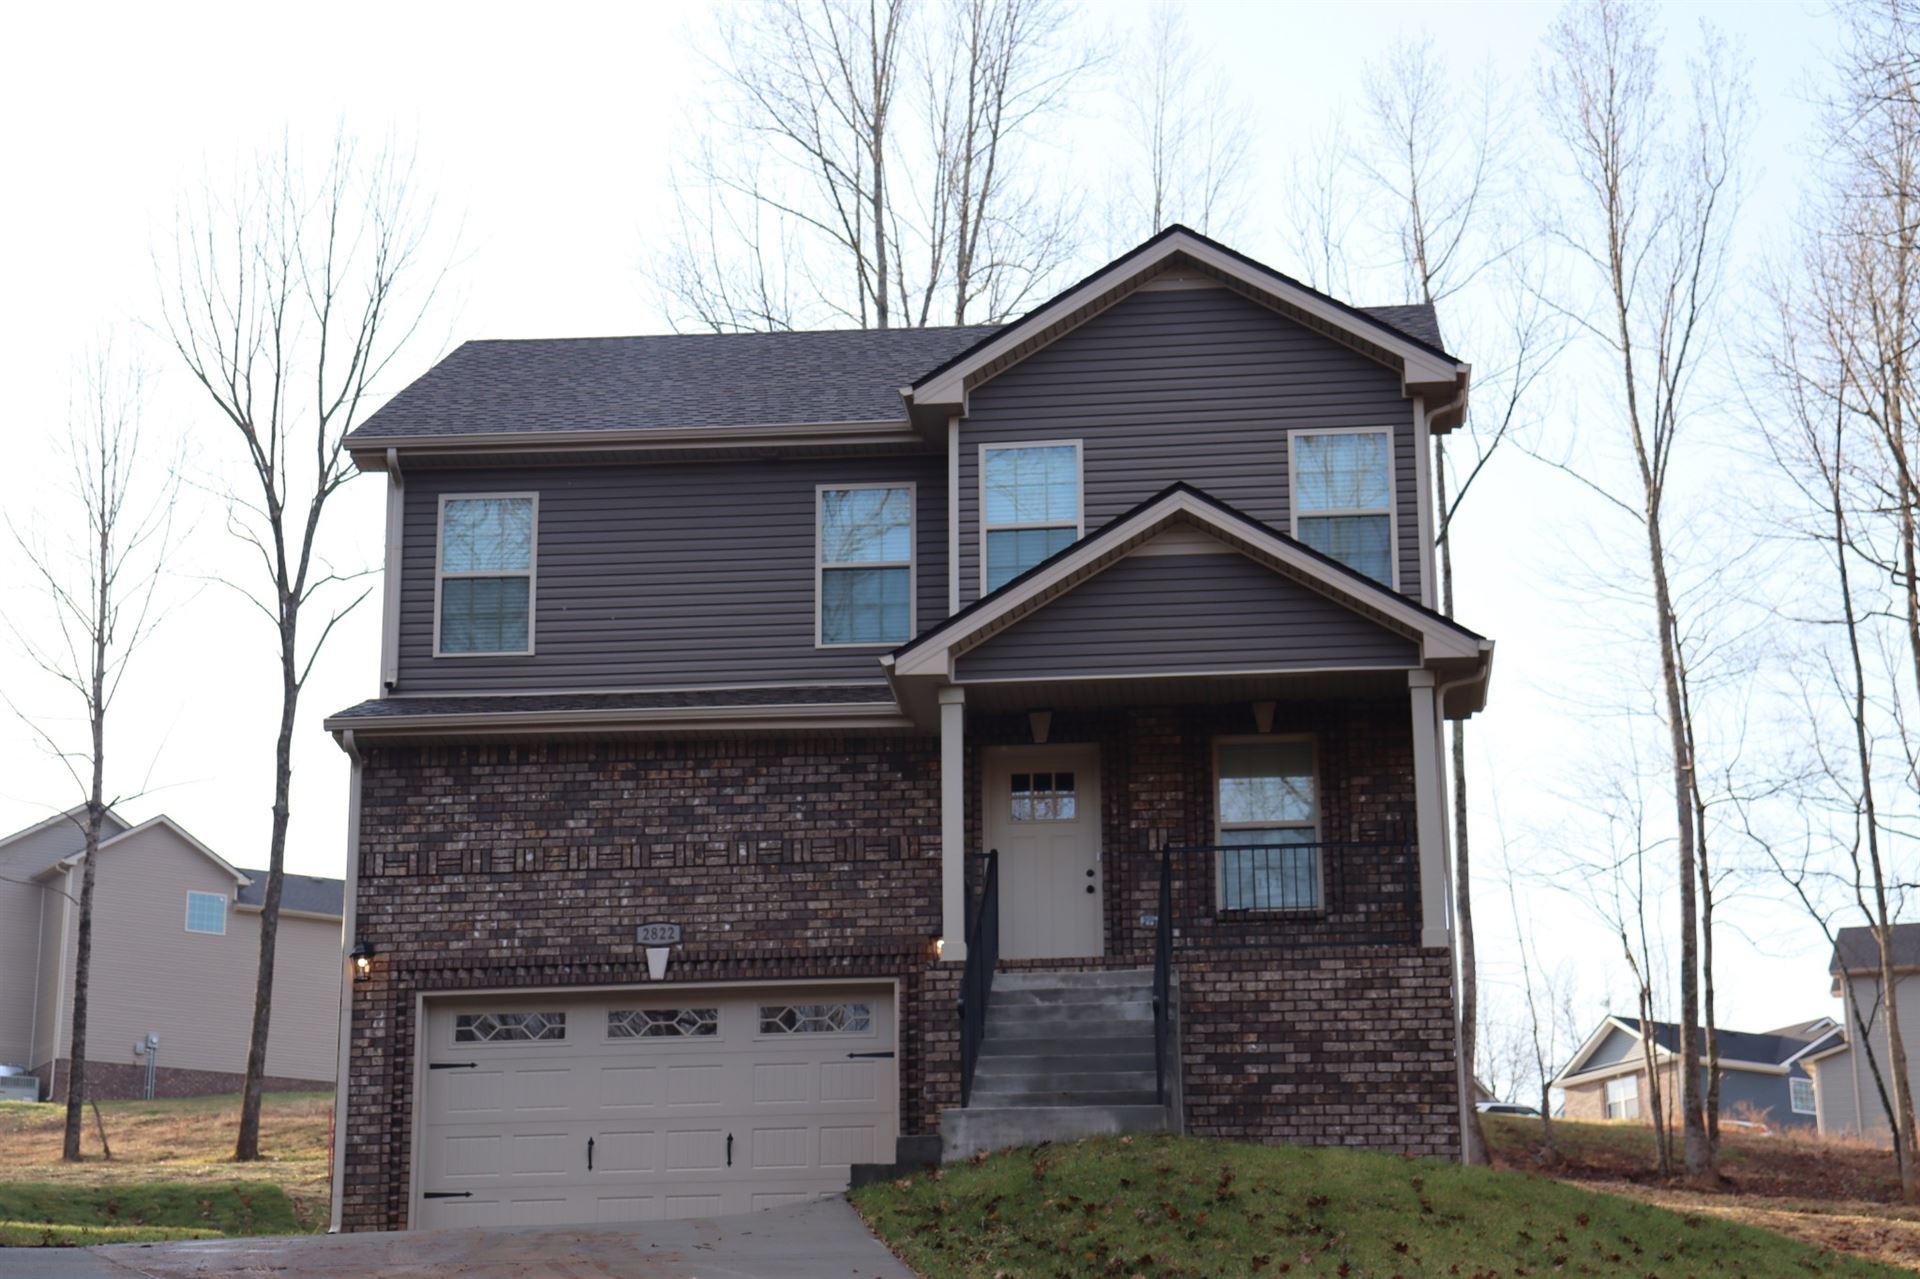 151 Glenstone, Clarksville, TN 37043 - MLS#: 2220515